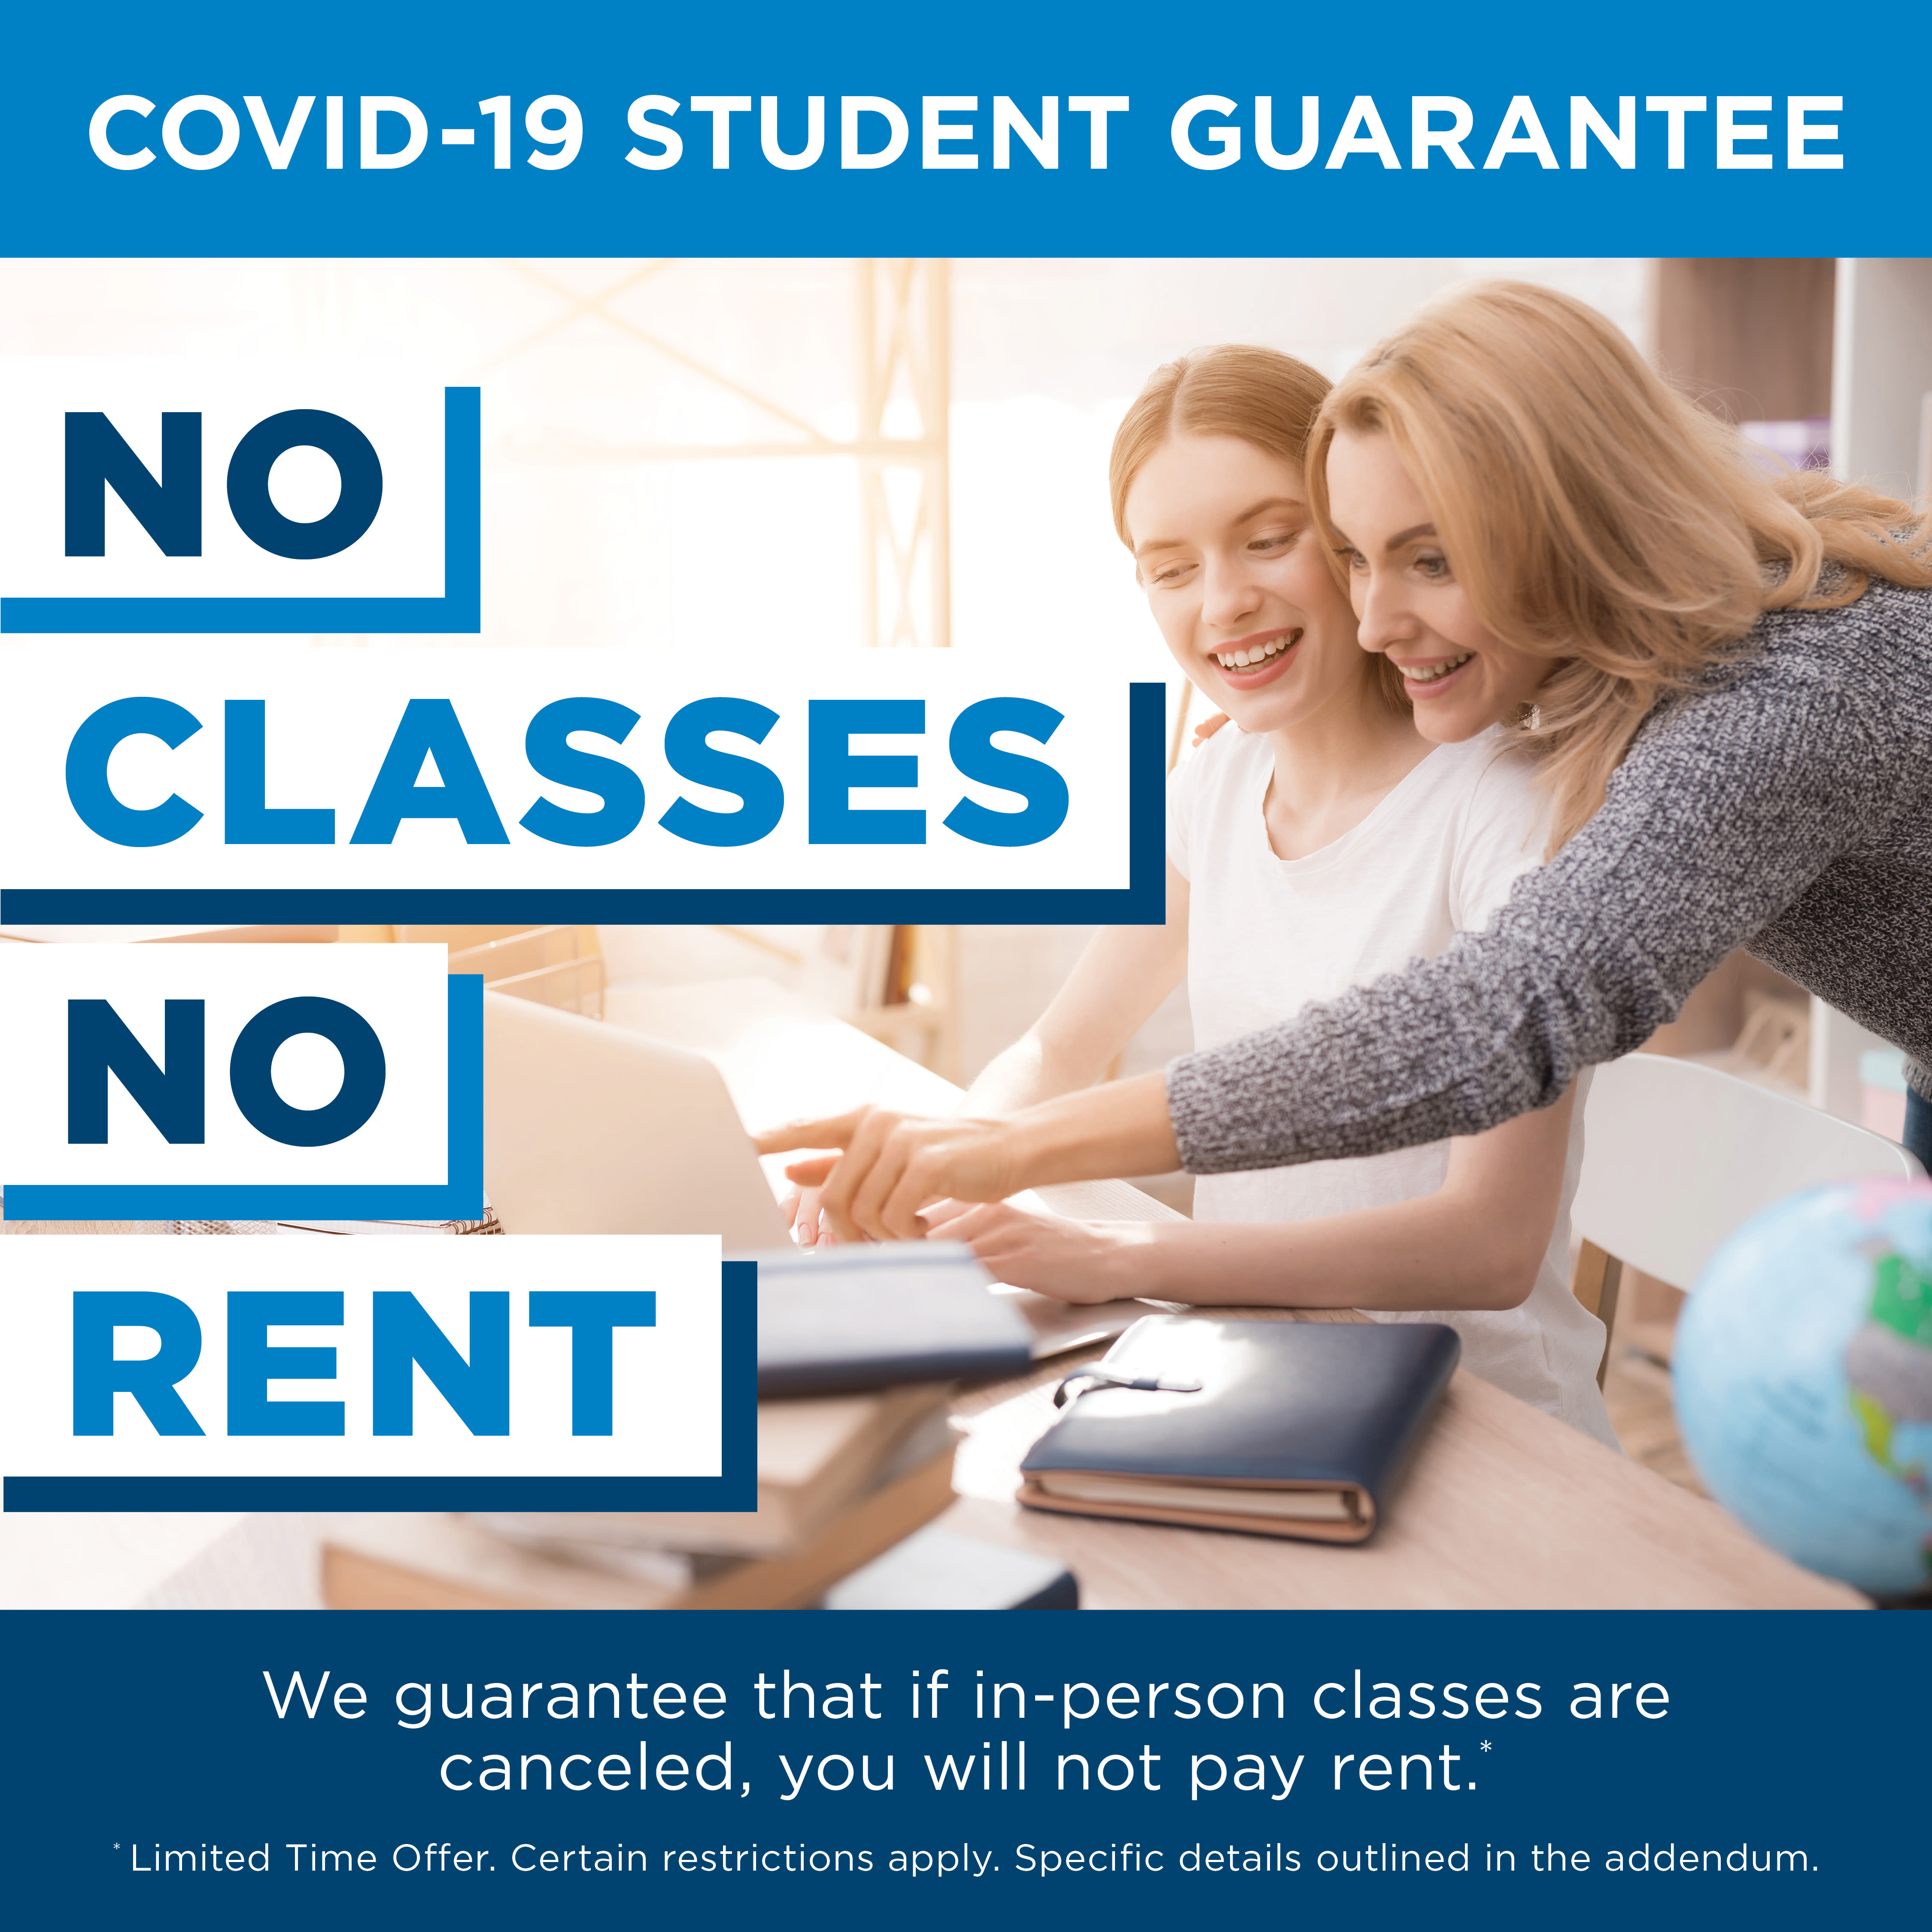 Briarwood Apartments & Townhomes COVID-19 Student Guarantee